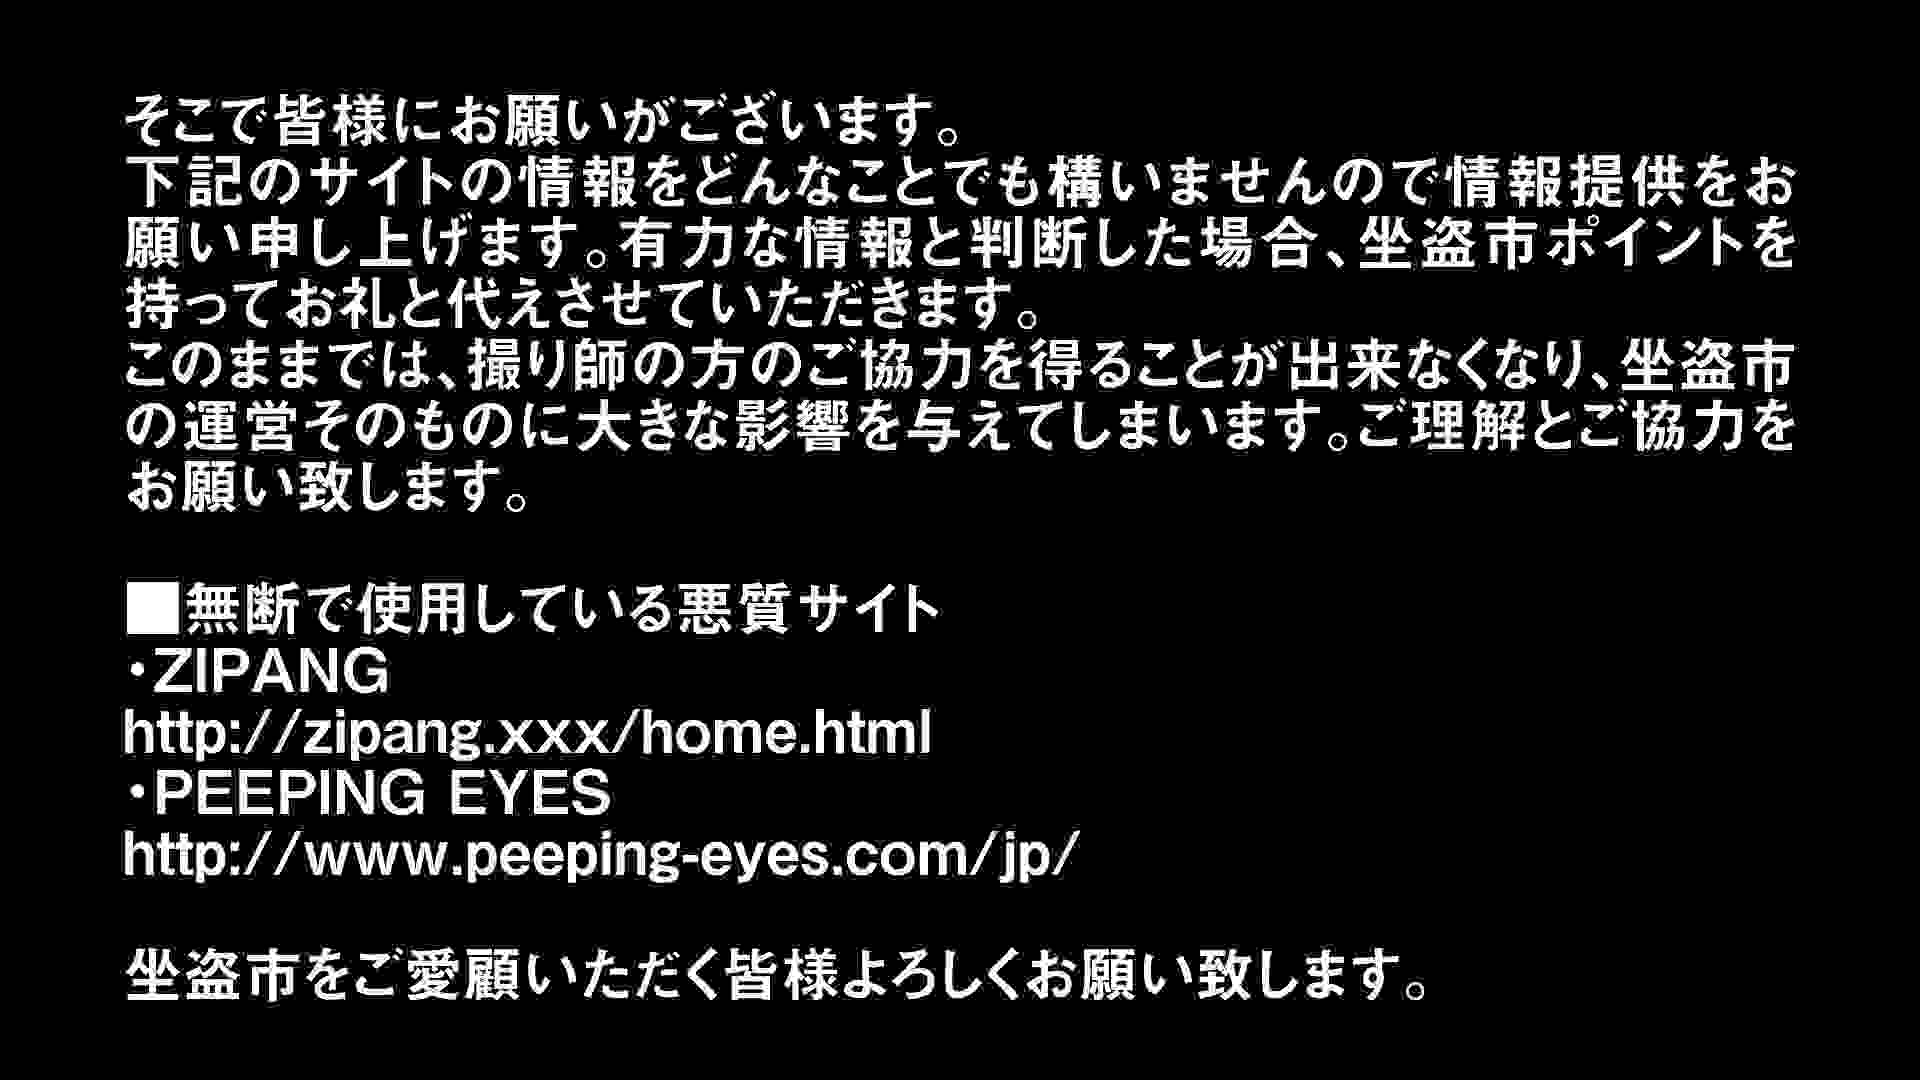 Aquaな露天風呂Vol.294 露天 セックス無修正動画無料 75画像 26